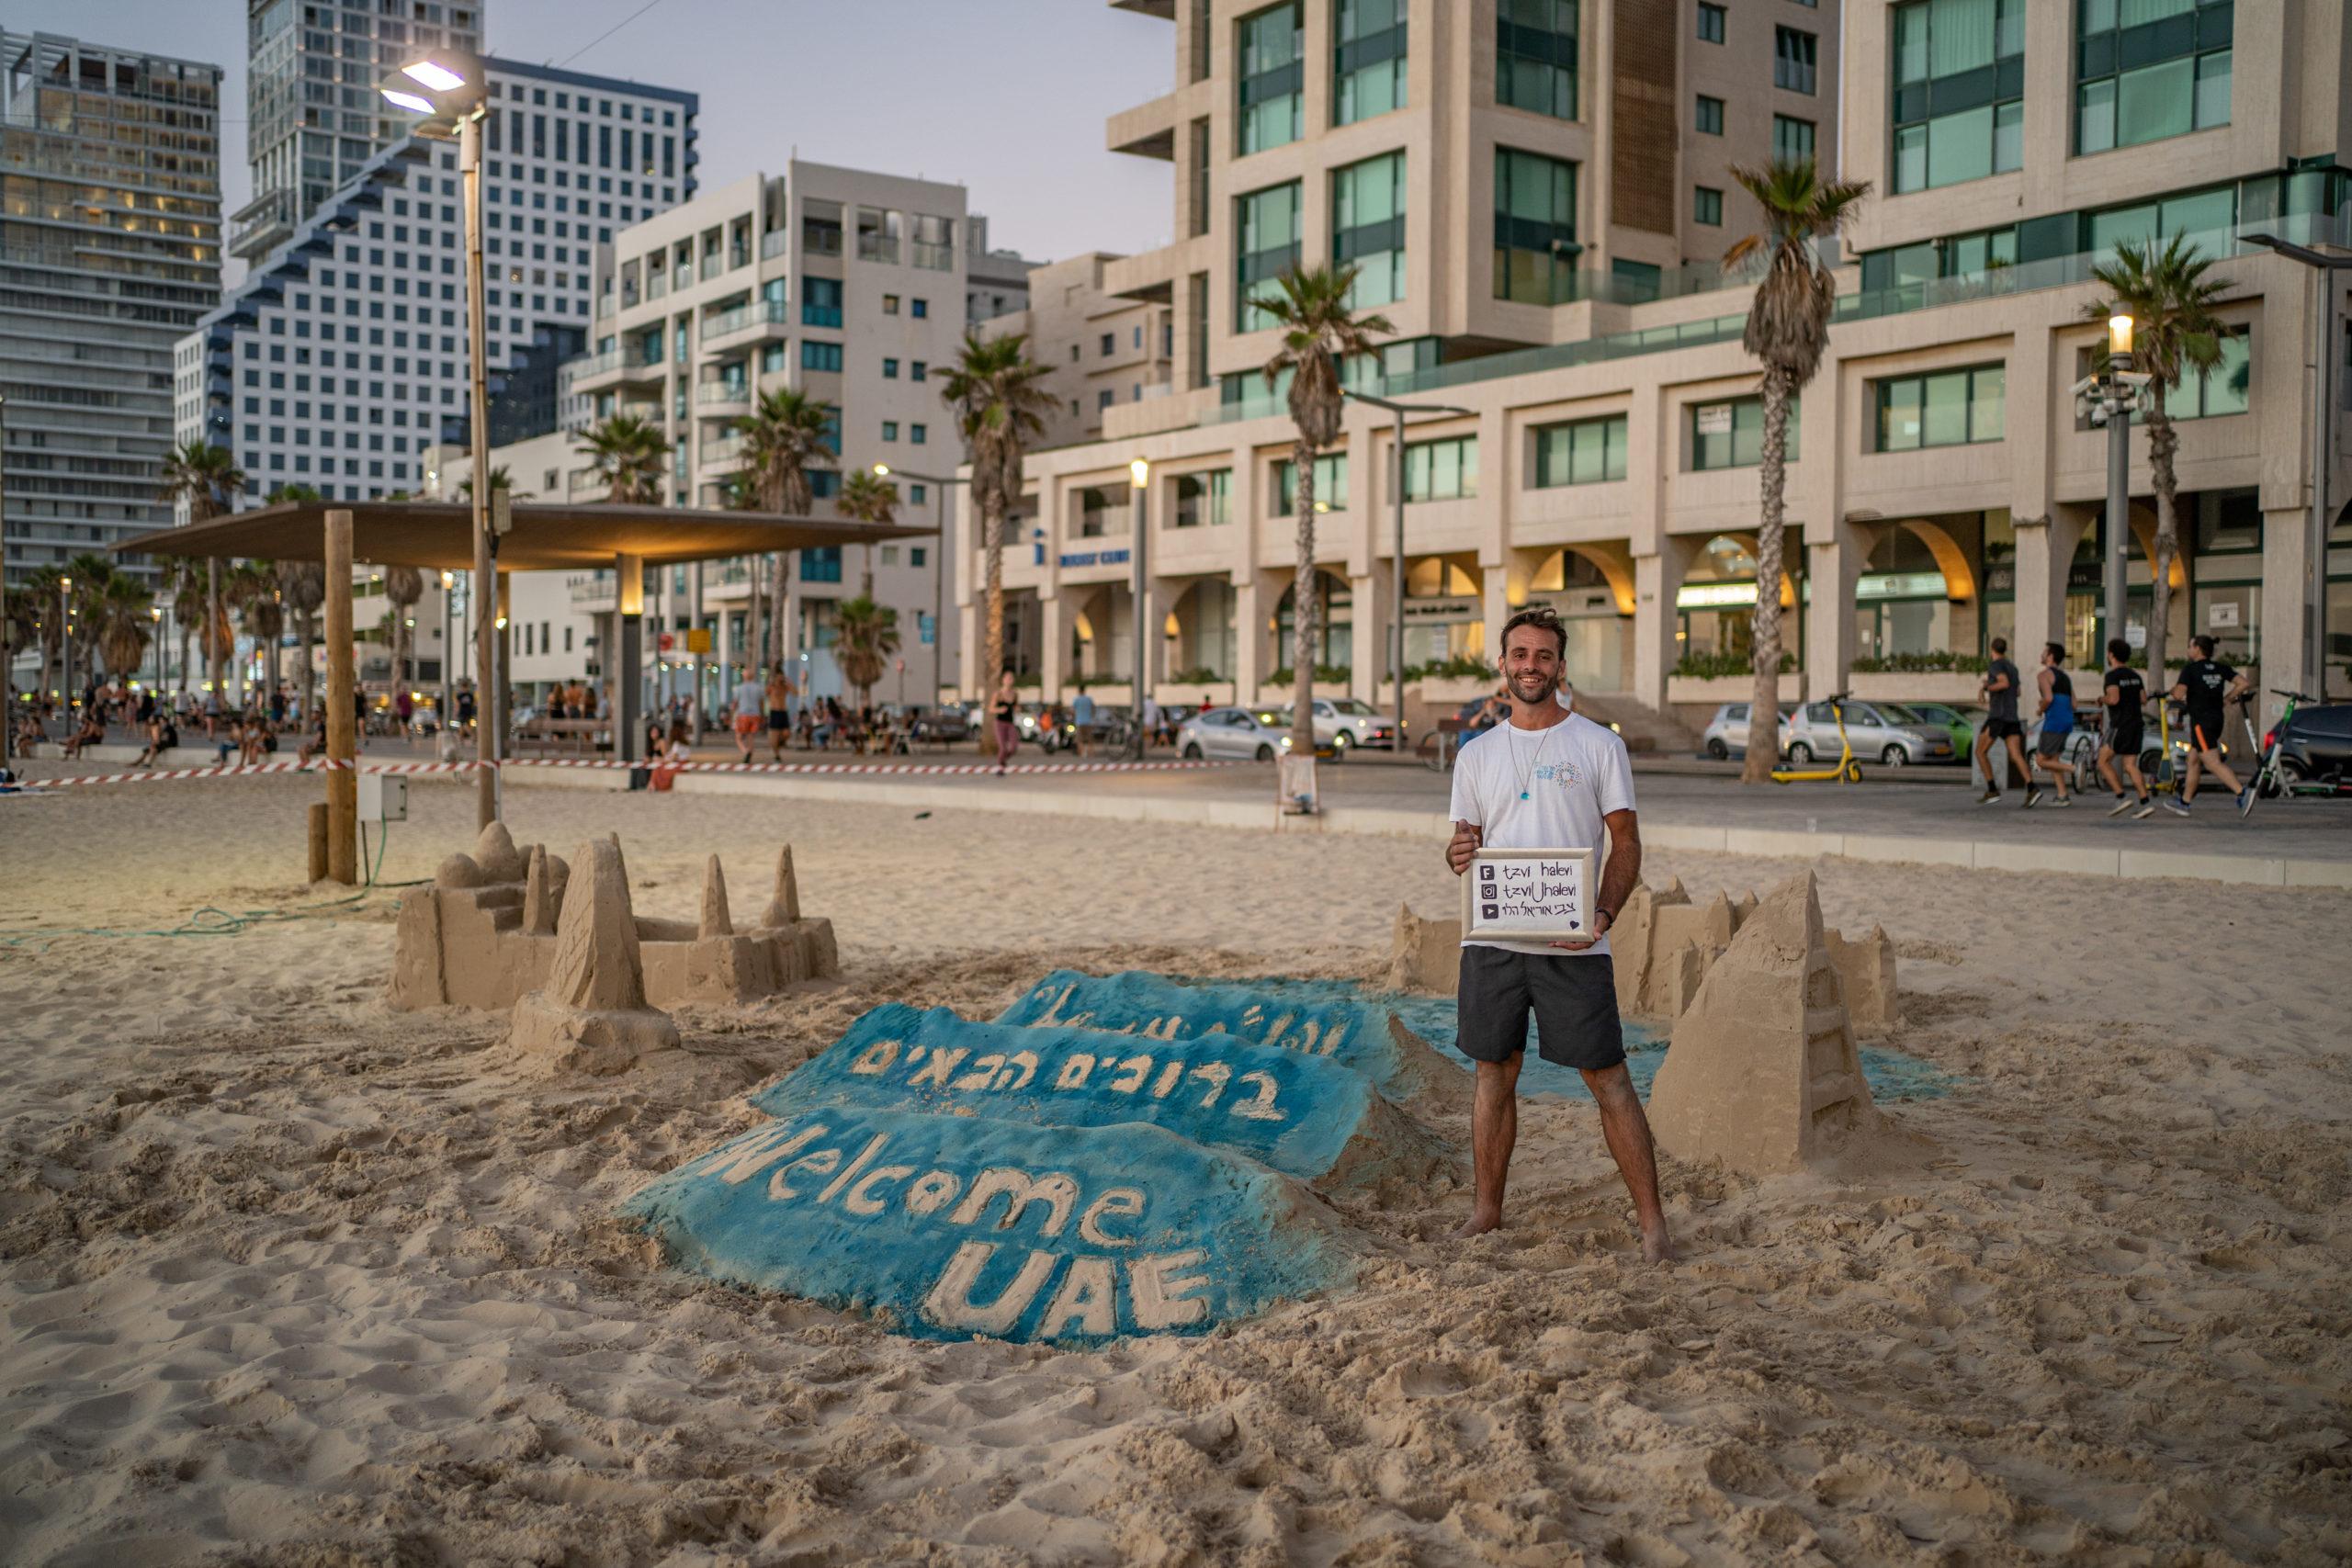 Tel Aviv-Yafo extends invitation to visitors from United Arab Emirates